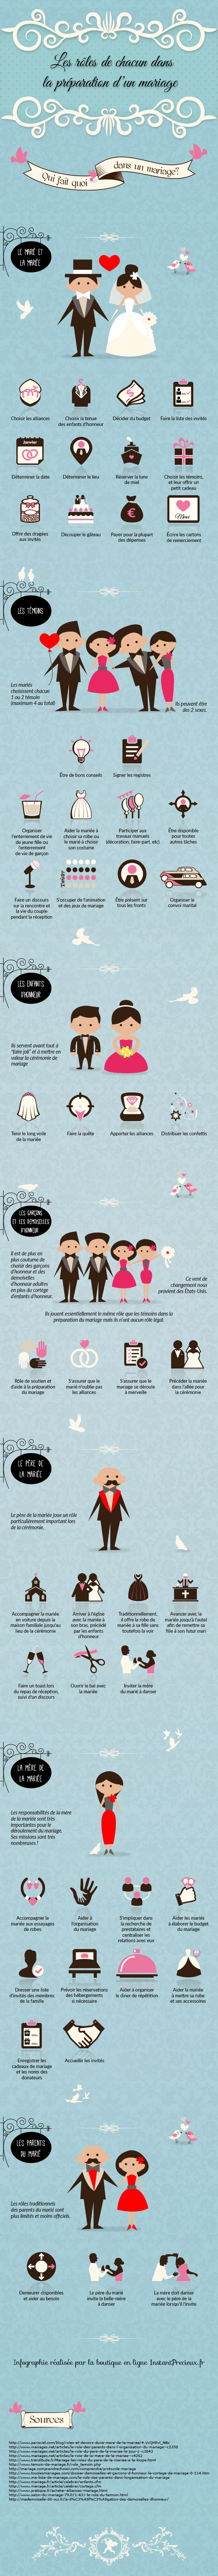 infographie-mariage-instant-precieux-min